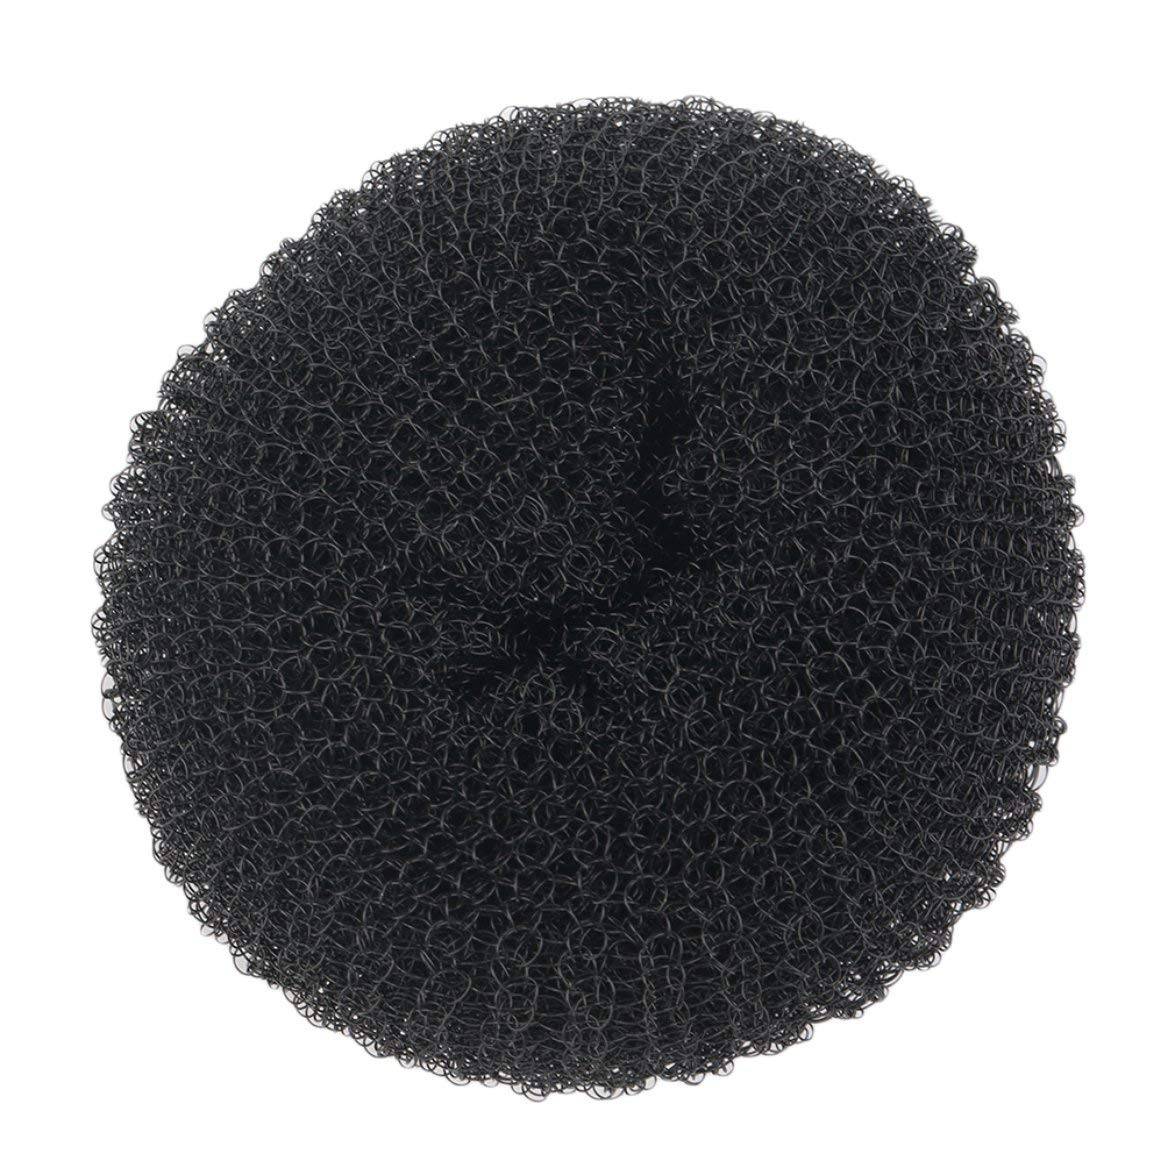 Kongqiabona Women Girls Sponge Hair Bun Maker Ring Donut Shape Hairband Styler Tool Magic Hair Styling Bun Maker Hair Band Accessories